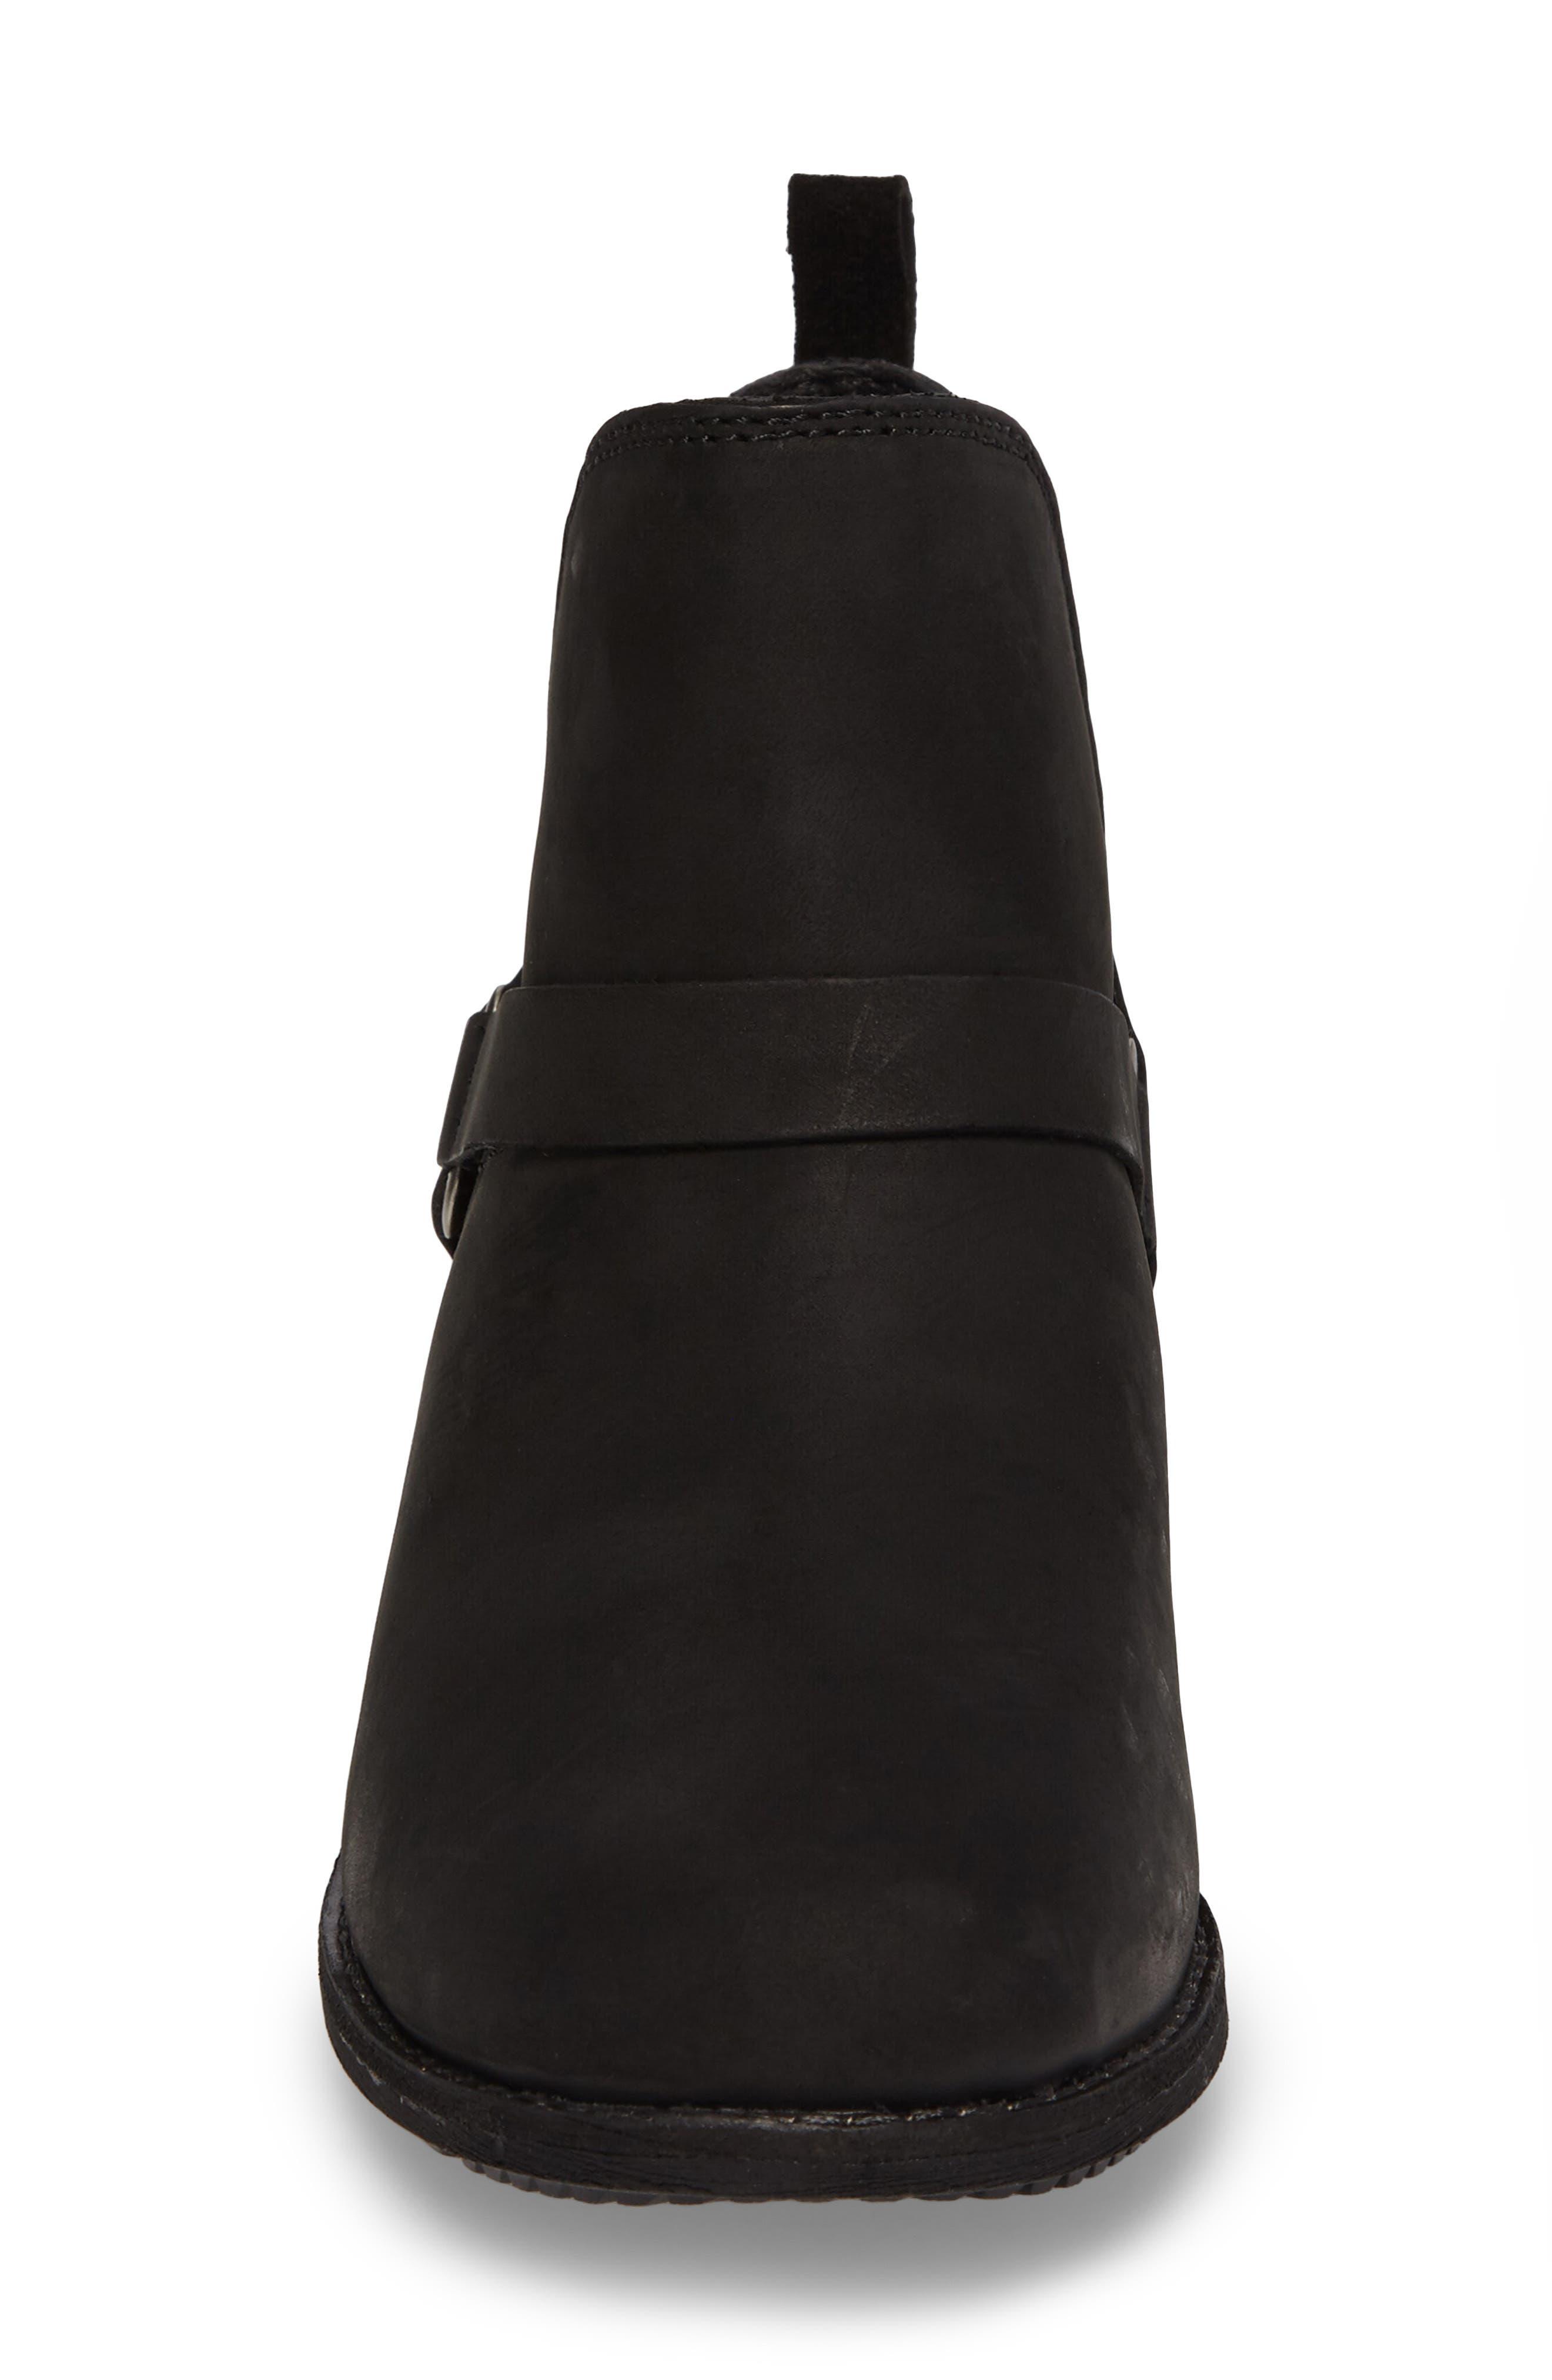 TEVA, De La Vina Dos Waterproof Chelsea Boot, Alternate thumbnail 4, color, BLACK LEATHER